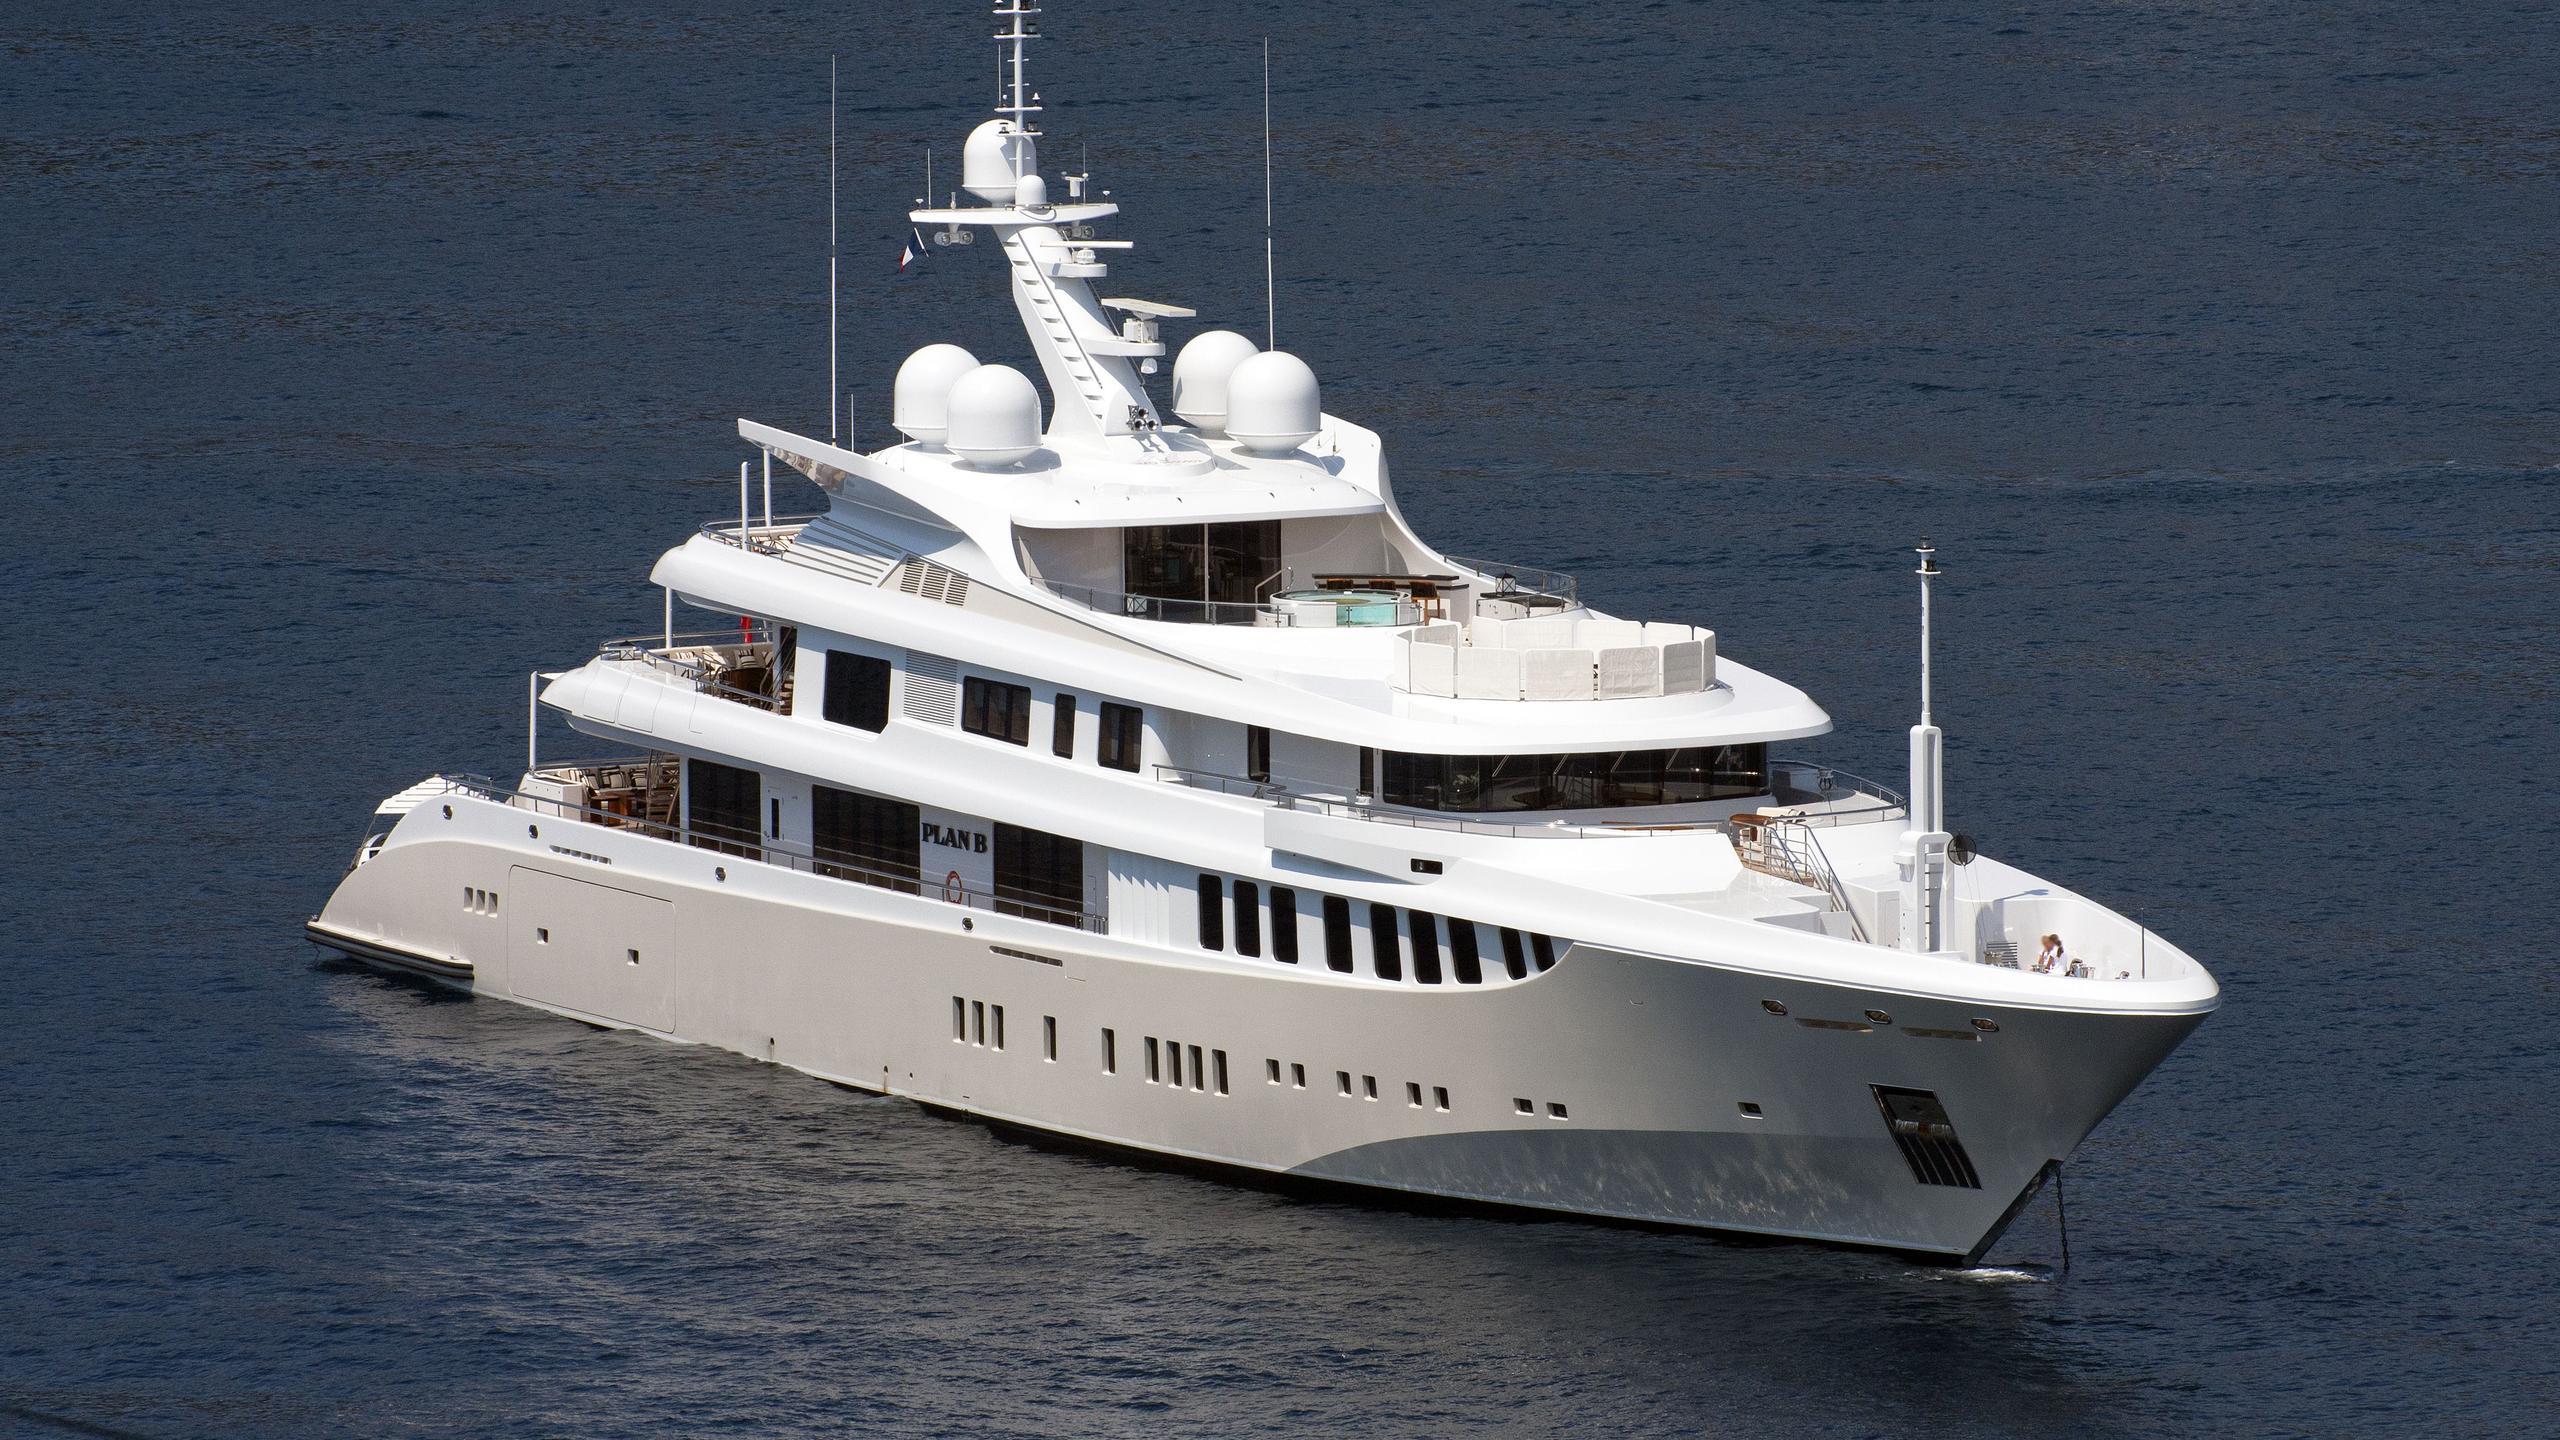 plan-b-motor-yacht-hdw-kiel-2012-73m-half-profile